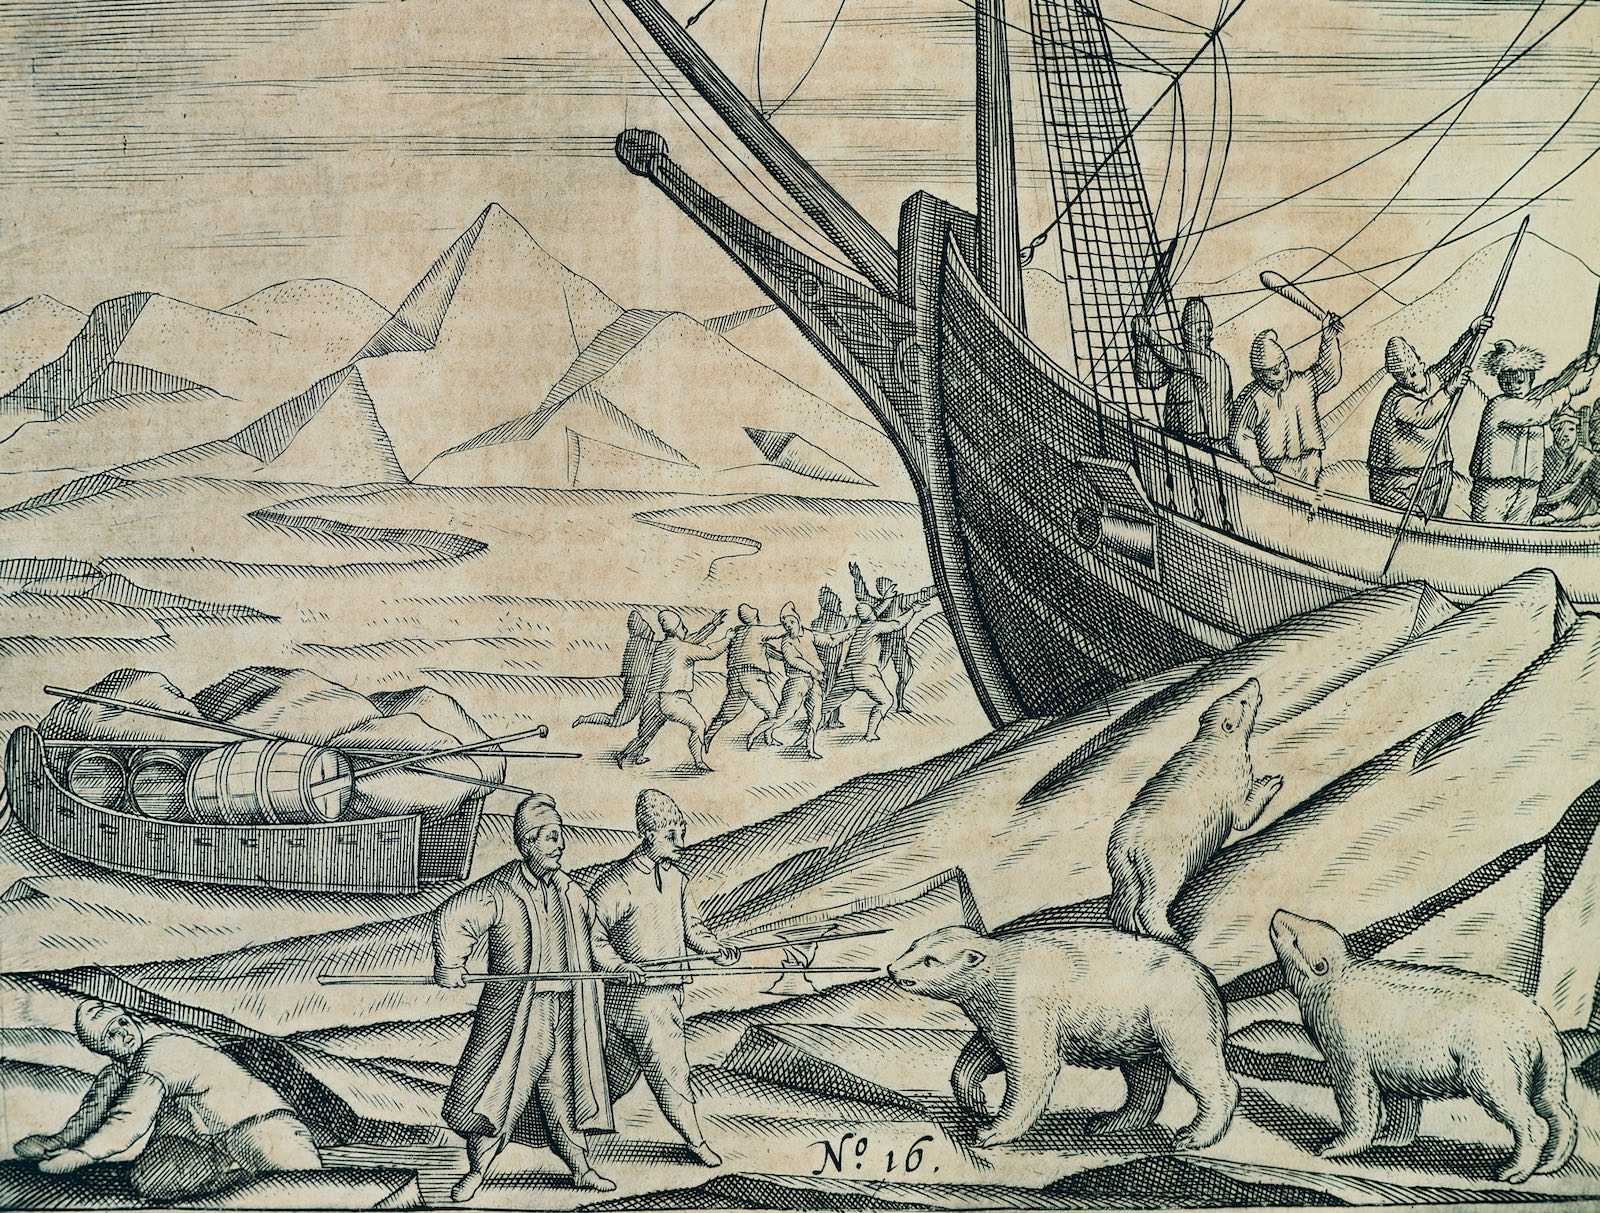 Sailors fight off polar bears